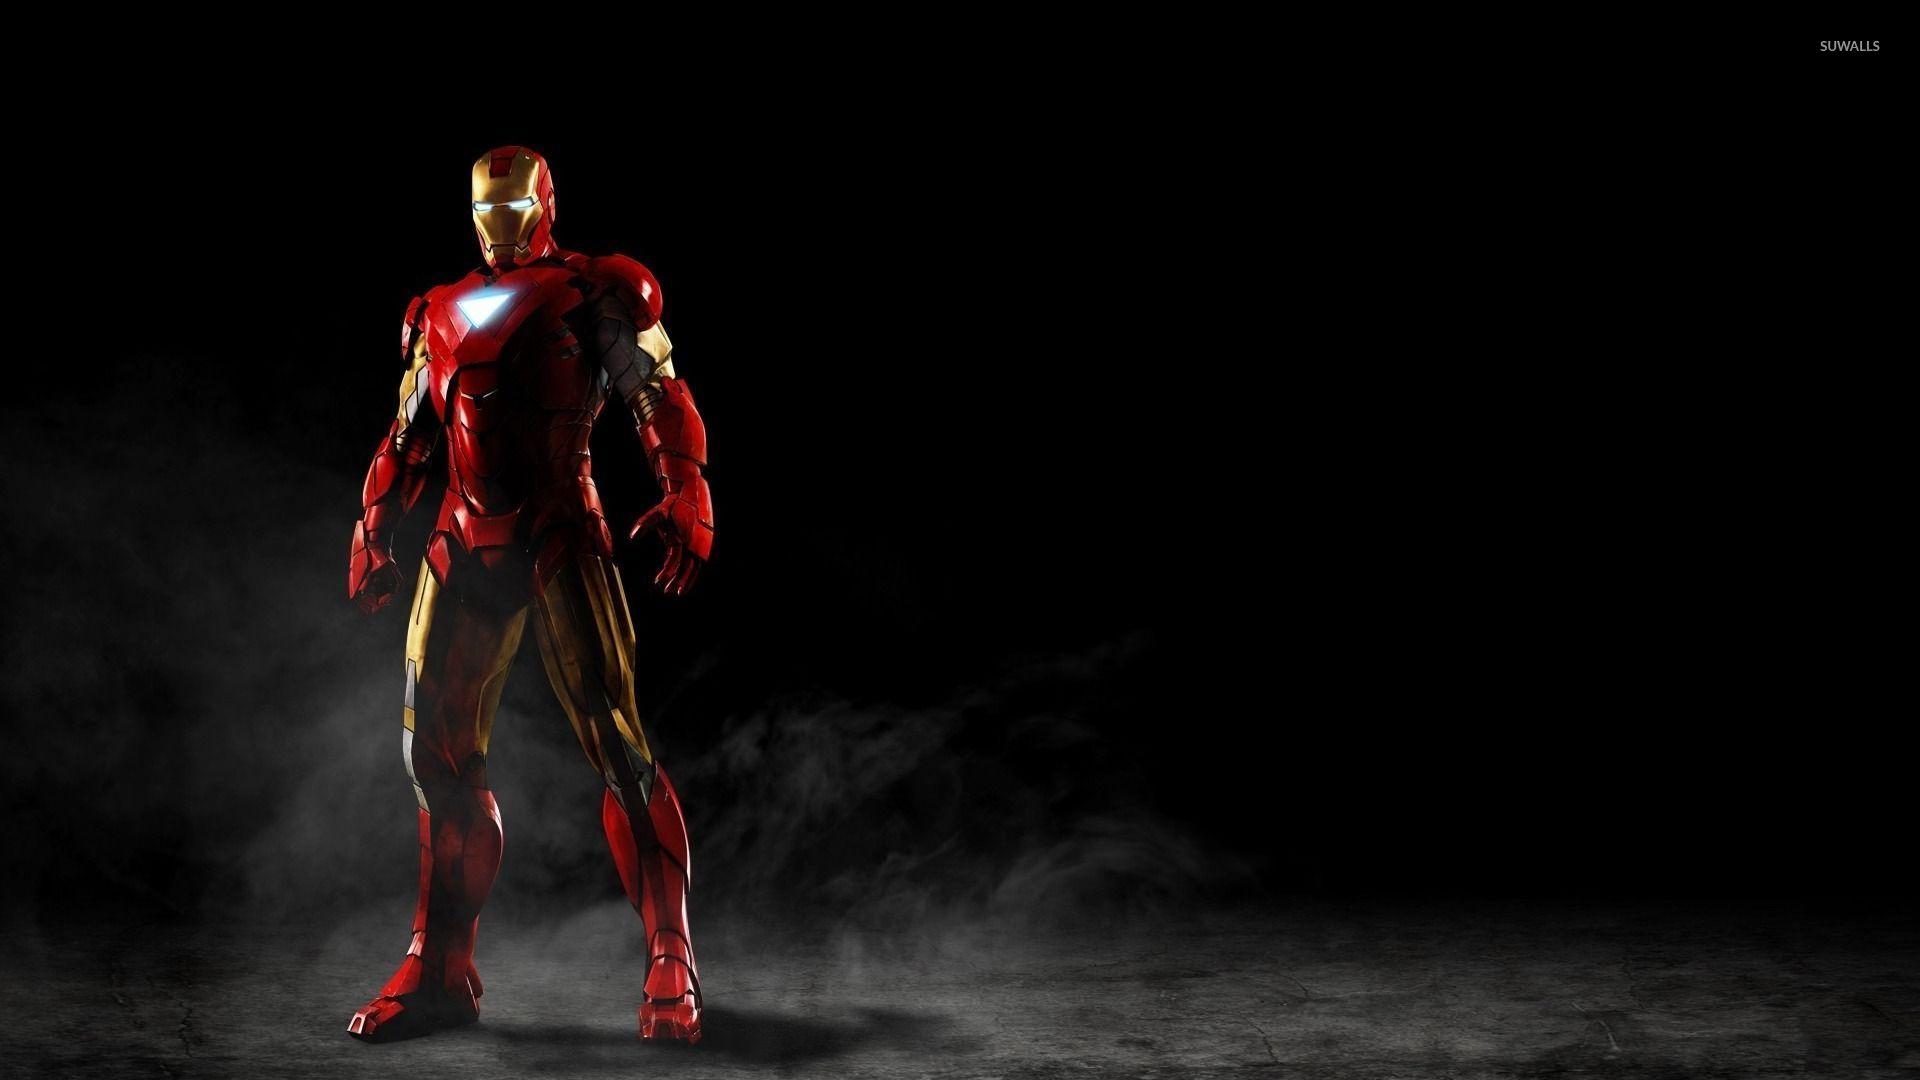 Iron Man Wallpaper Hd Tab Theme Supertab Themes